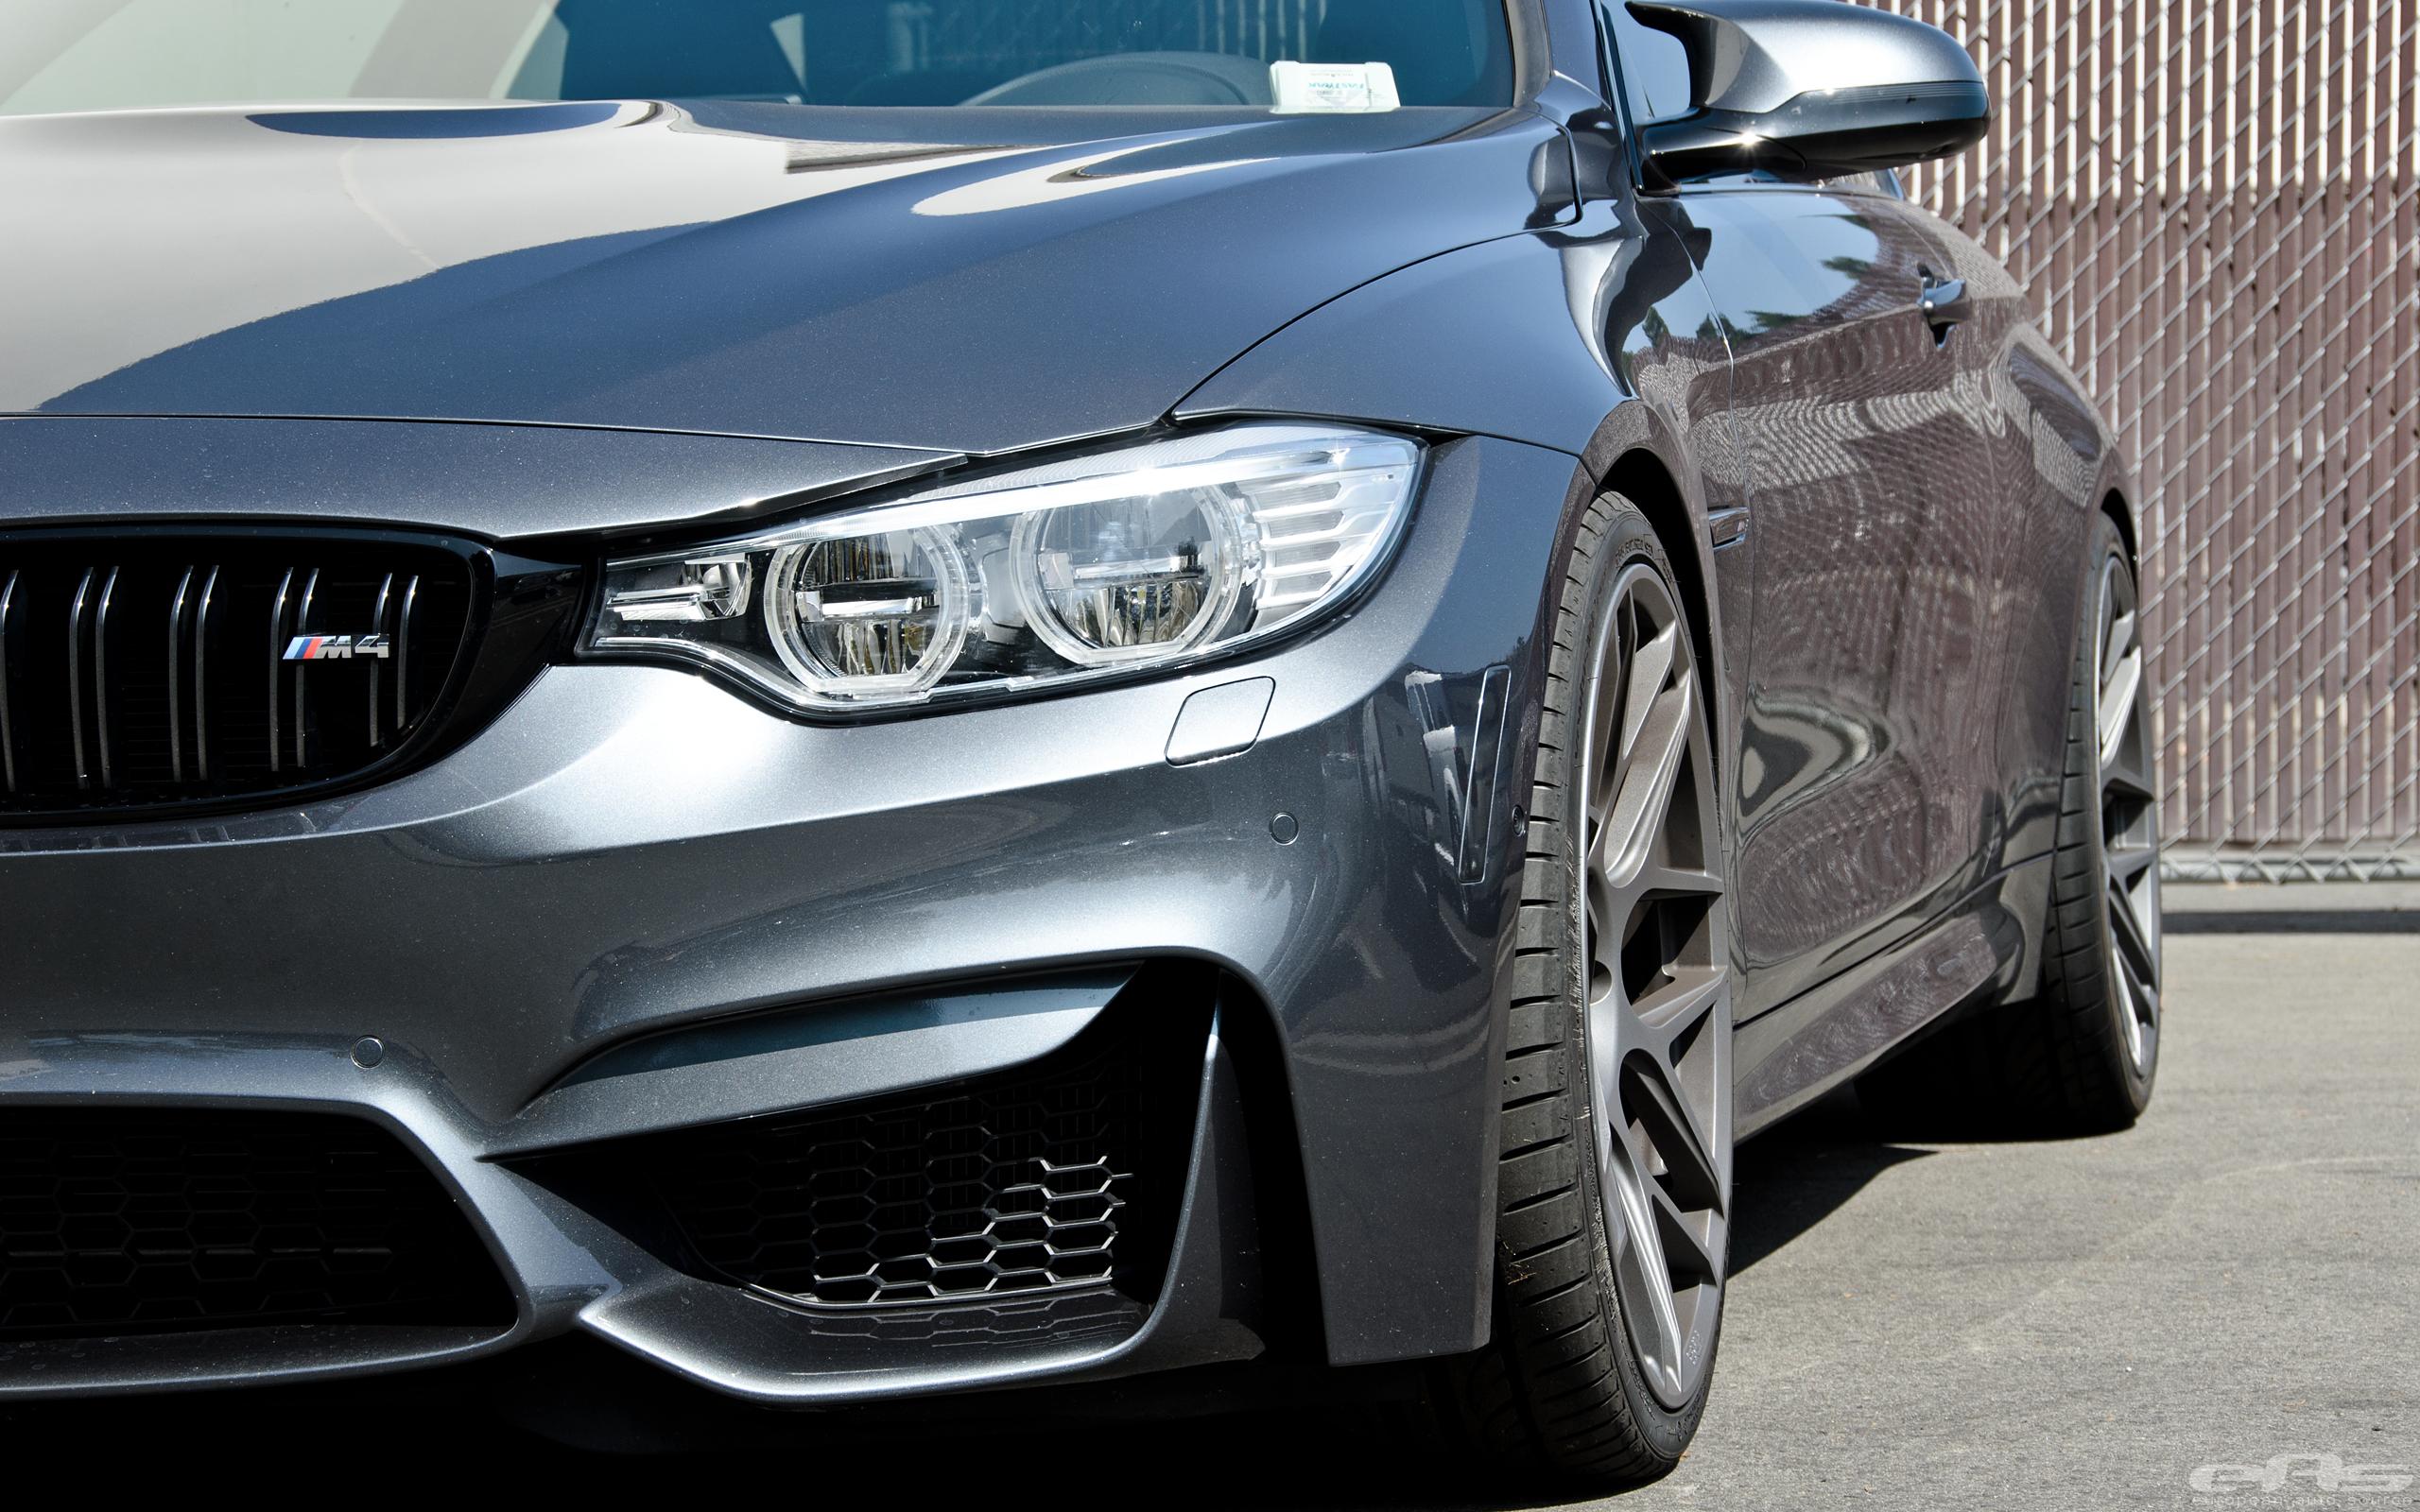 Mineral Gray M4 On Hre Flowform Wheels Bmw Performance